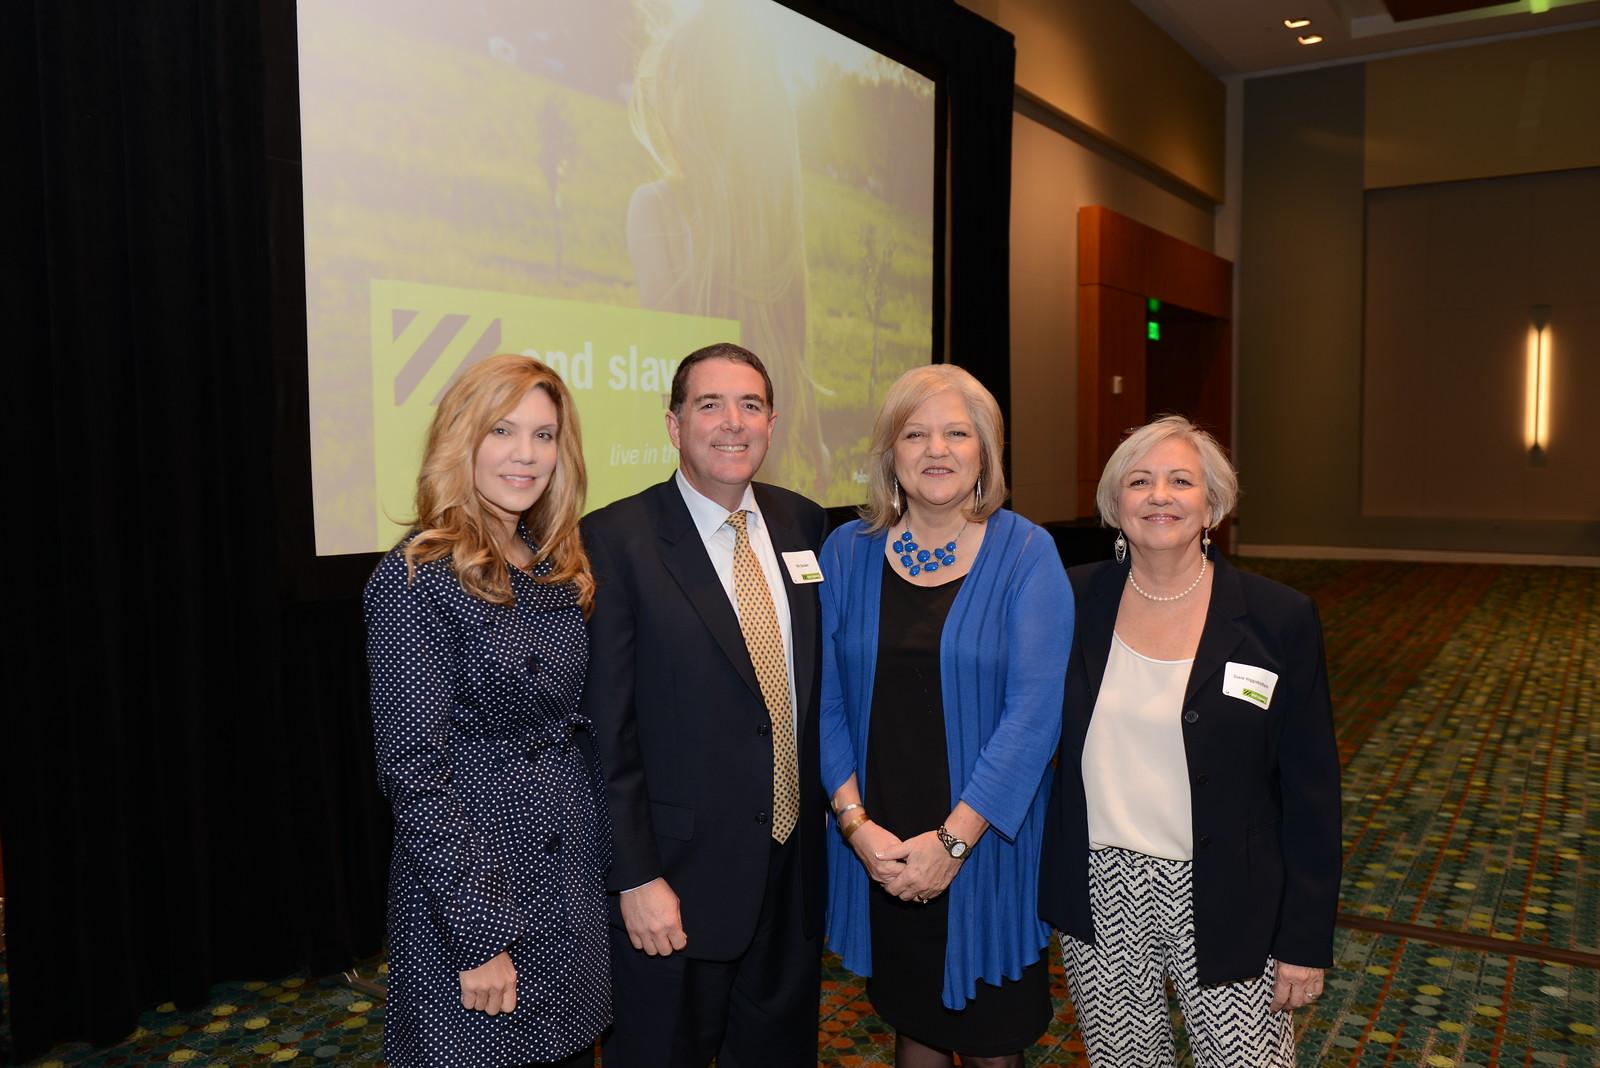 Alison Krauss with ESTN Board Executive Committee. Pictured from left to right: Alison Krauss, Bill Decker, Derri Smith, Susie Higginbotham